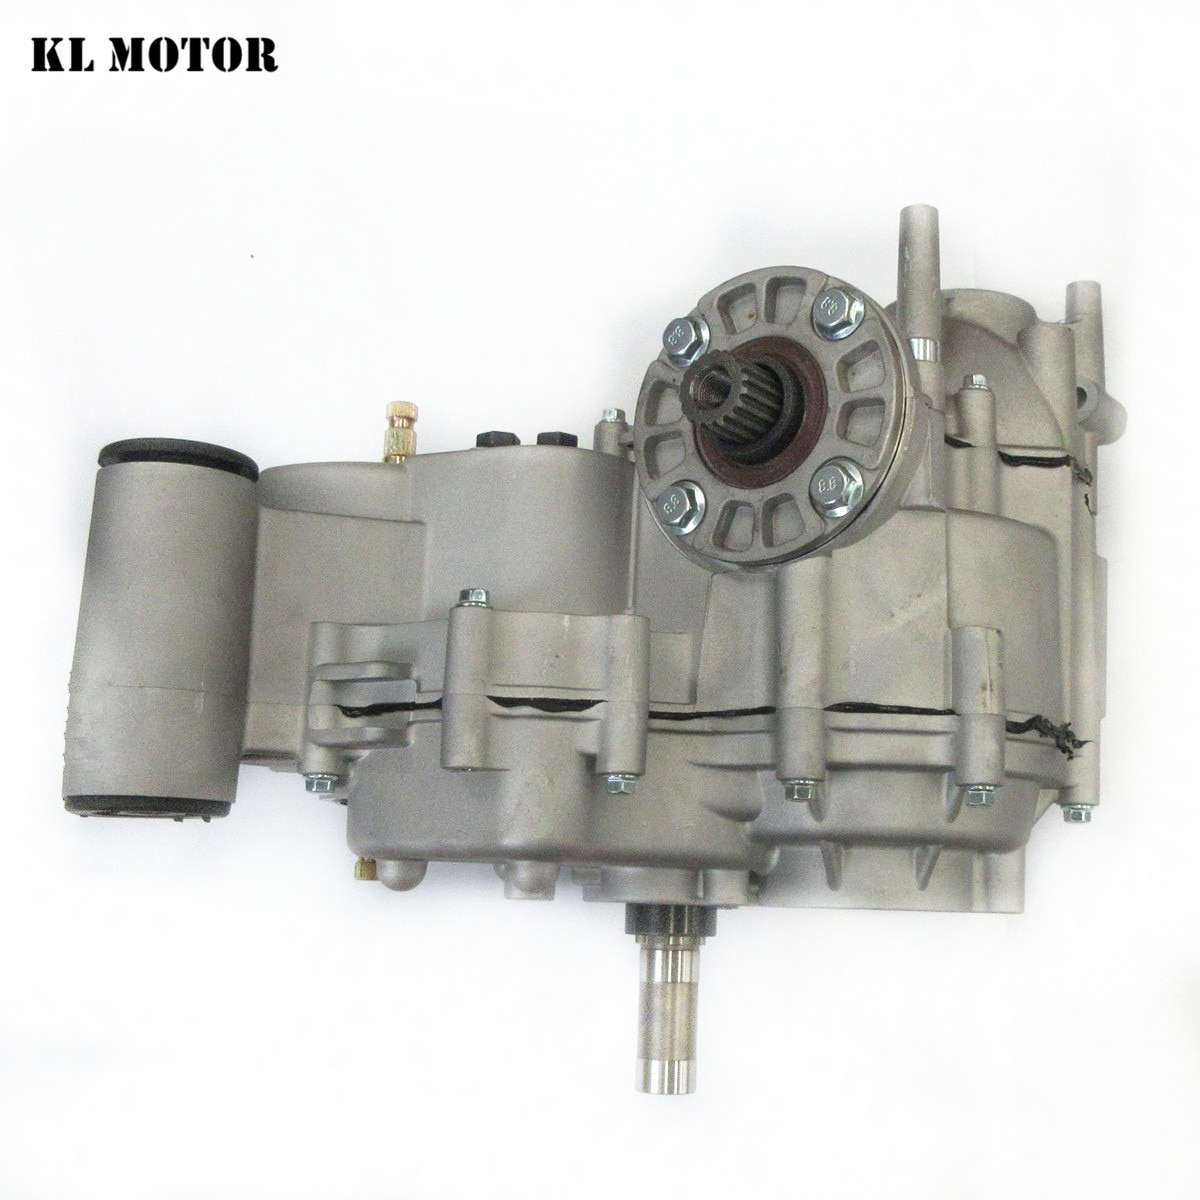 BRP 800 Can-am 800 gearbox for ATV UTV QUAD BIKE420684780 420685390 420685391 420685392 420685394 enlarge